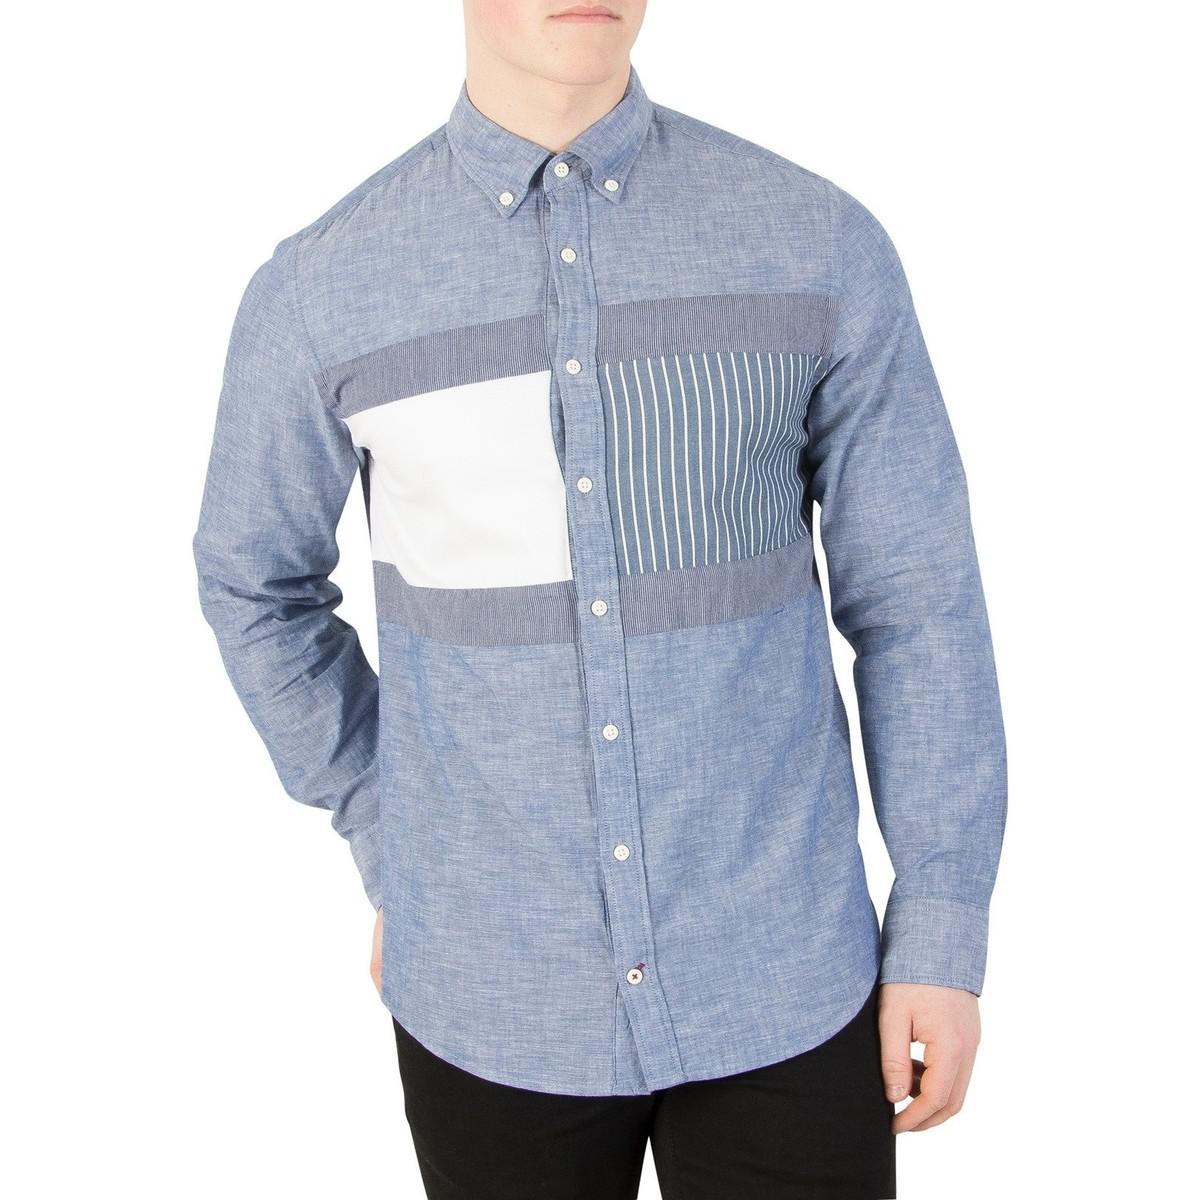 b41457fb704 Tommy Hilfiger Flag Patchwork Long Sleeve Shirt in Blue for Men - Lyst